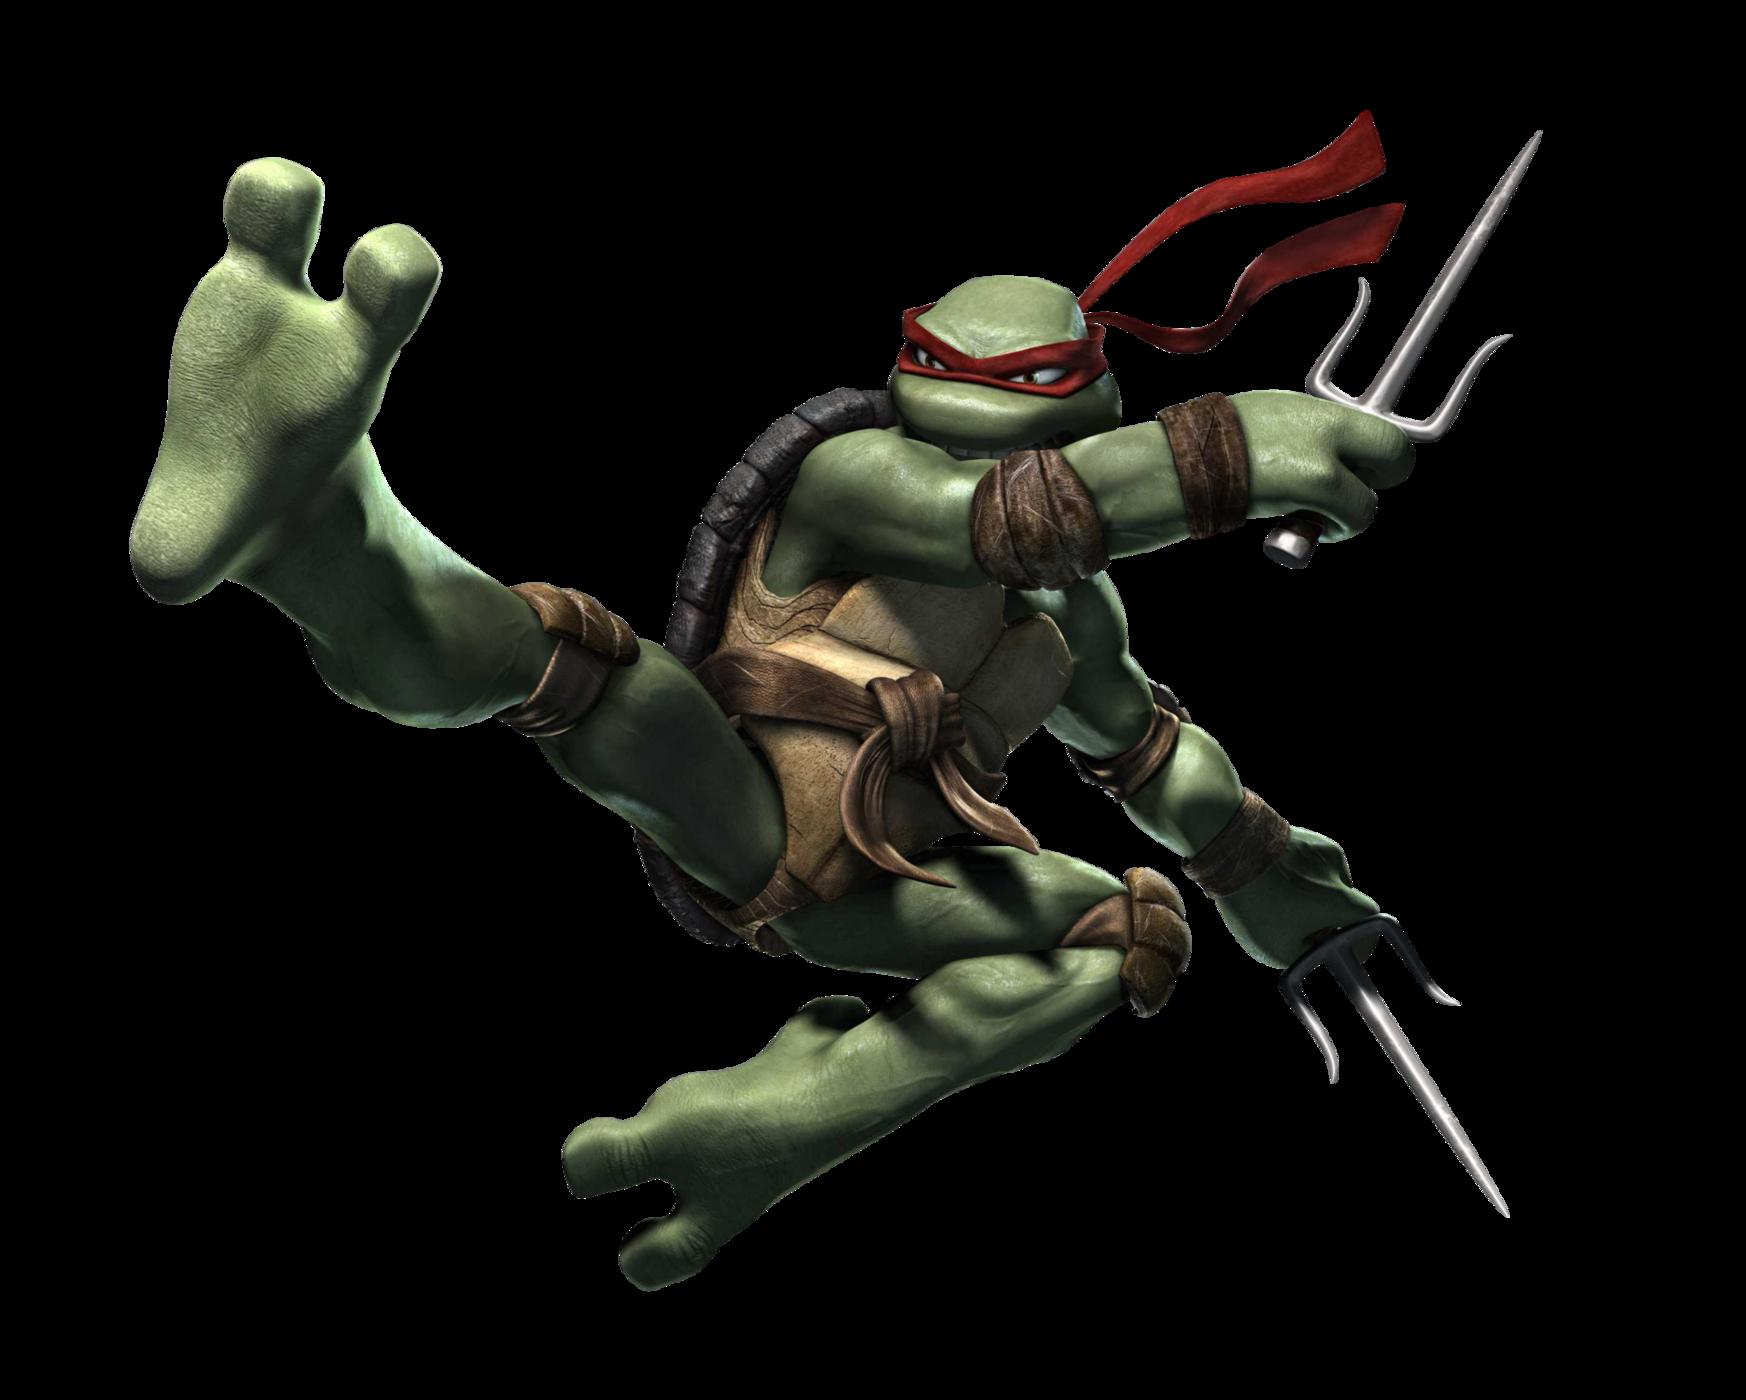 Ninja Tutle Raphael PNG Image